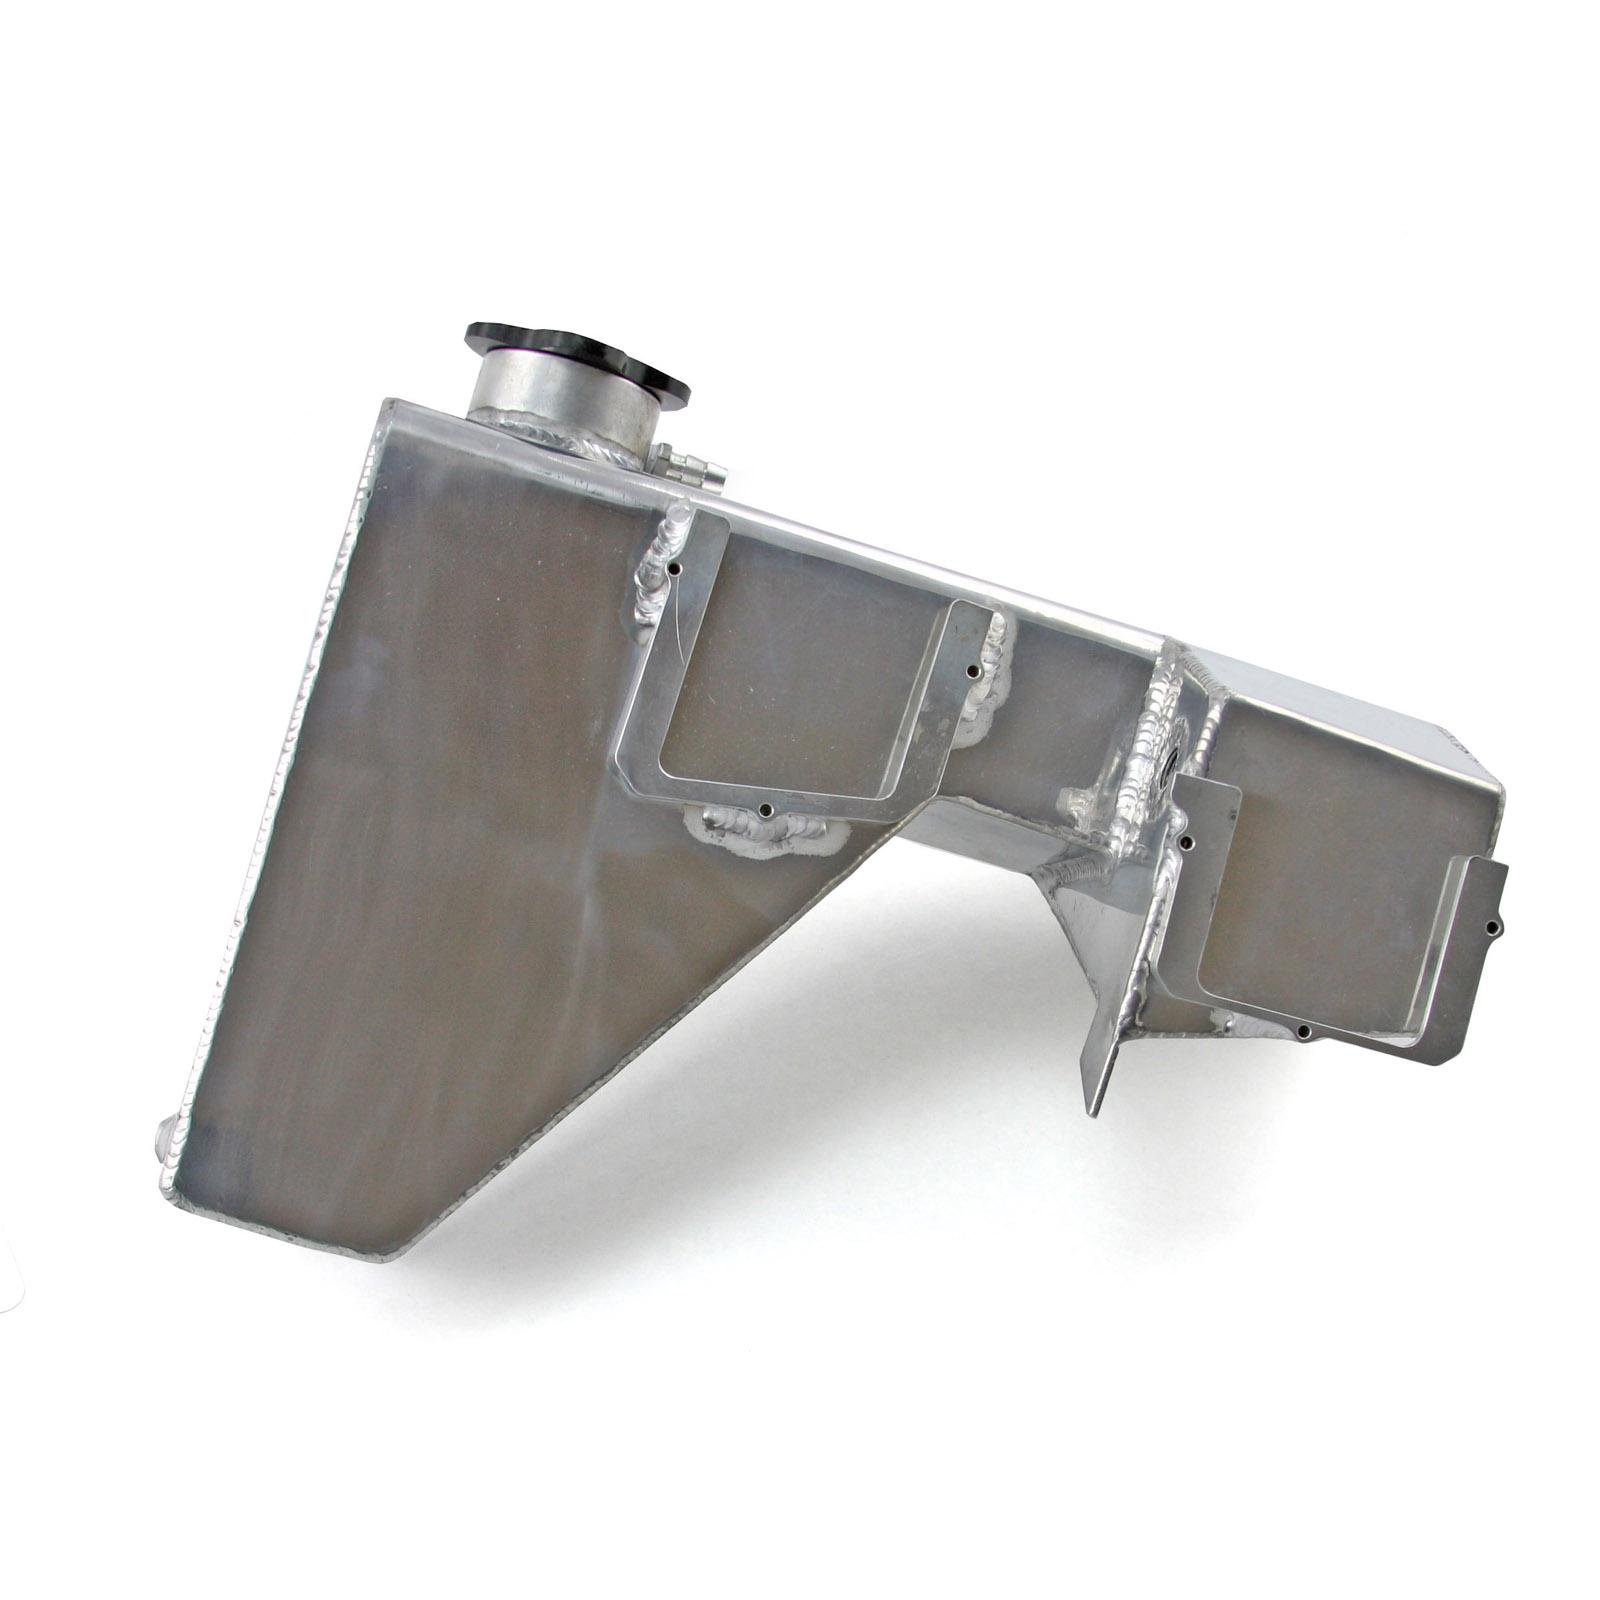 "Speedmaster Engine Coolant Reservoir PCE188.1001; Stainless Steel 12.000/"" 2.000/"""